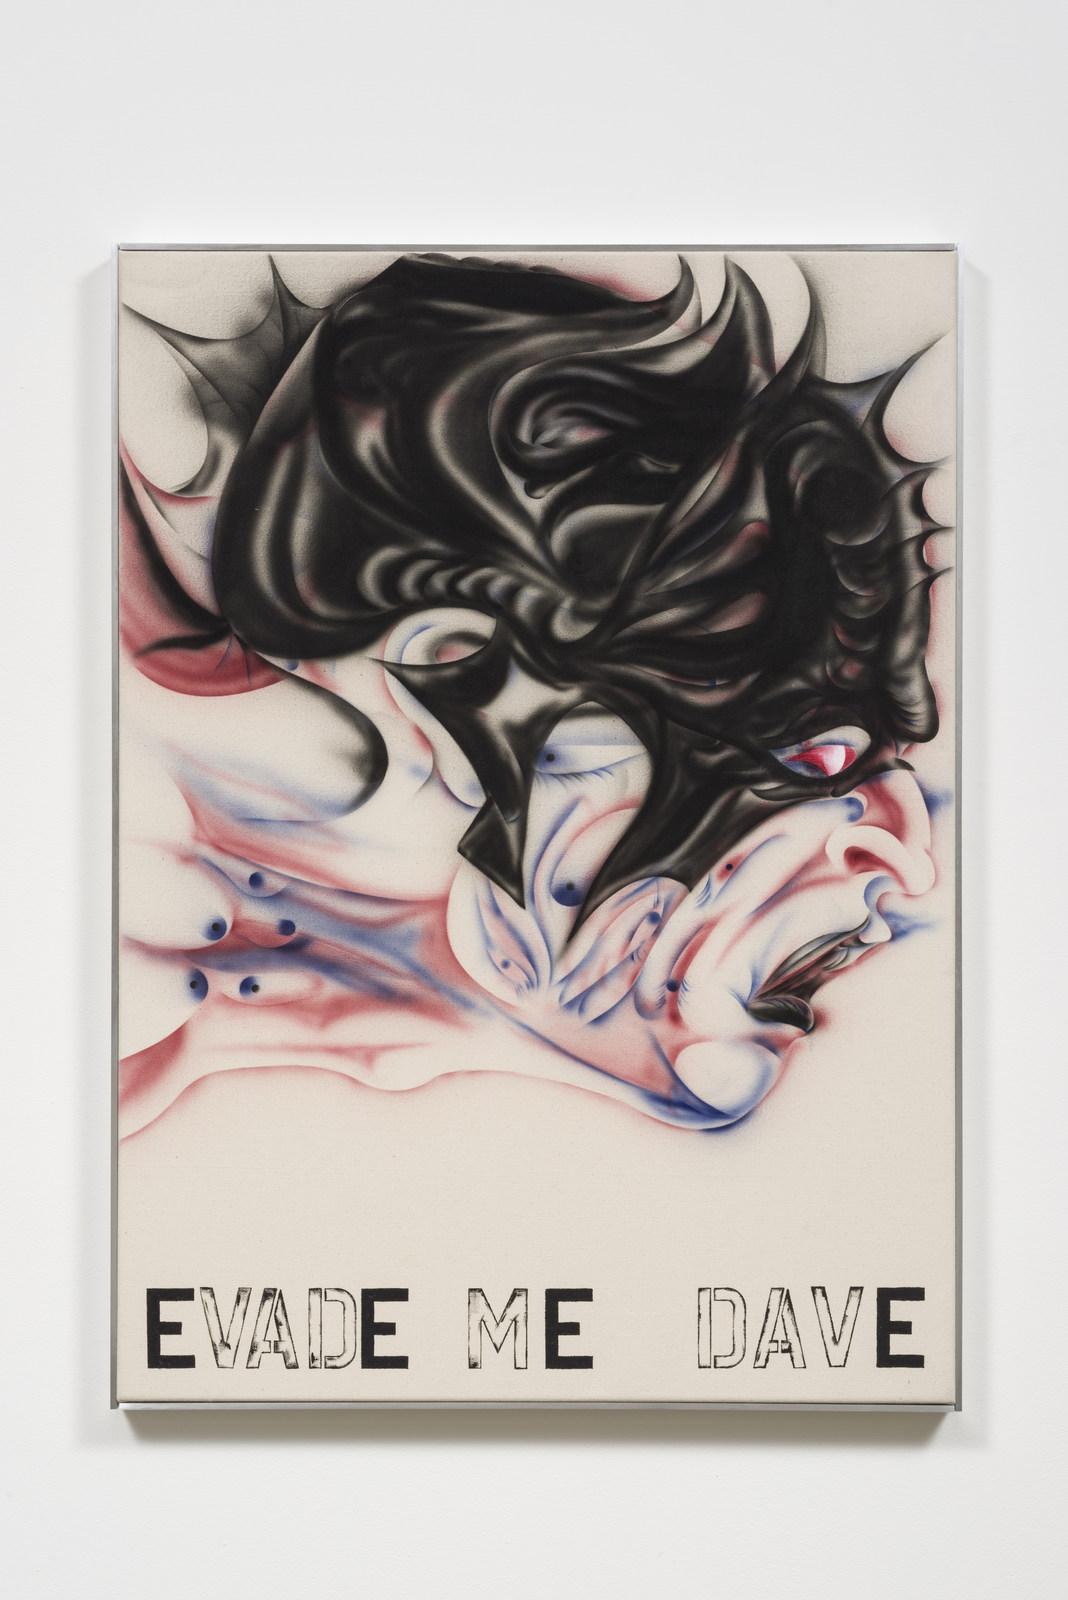 Zoe Barcza, Evade Me Dave, 2016